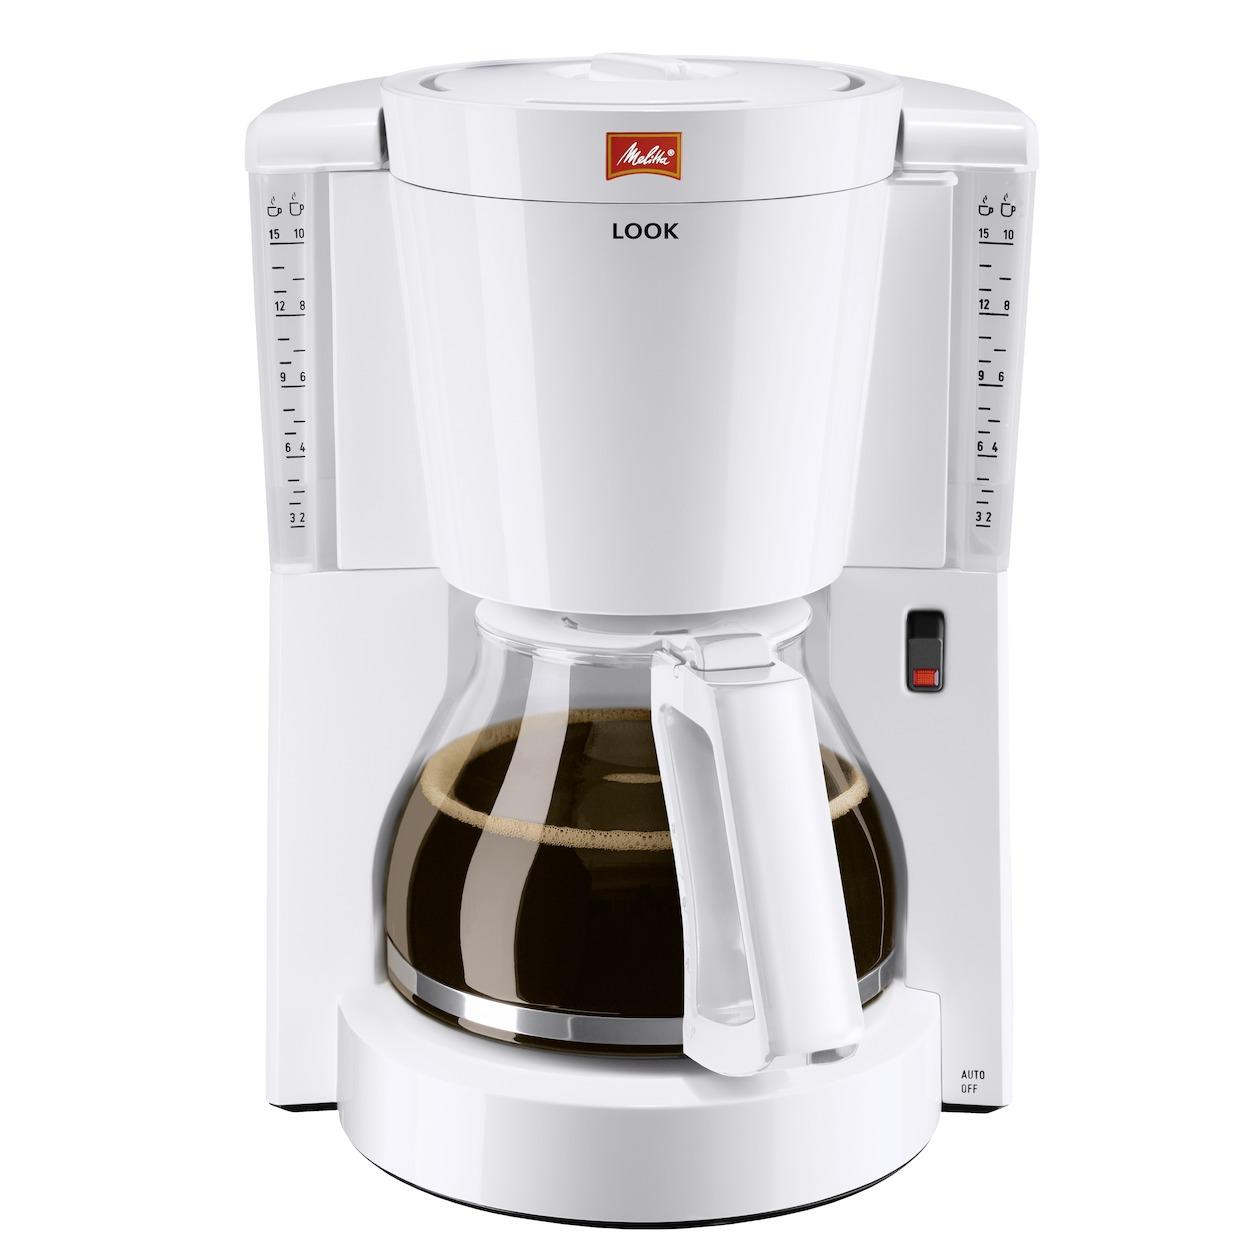 Melitta koffiefilter apparaat Look IV wit